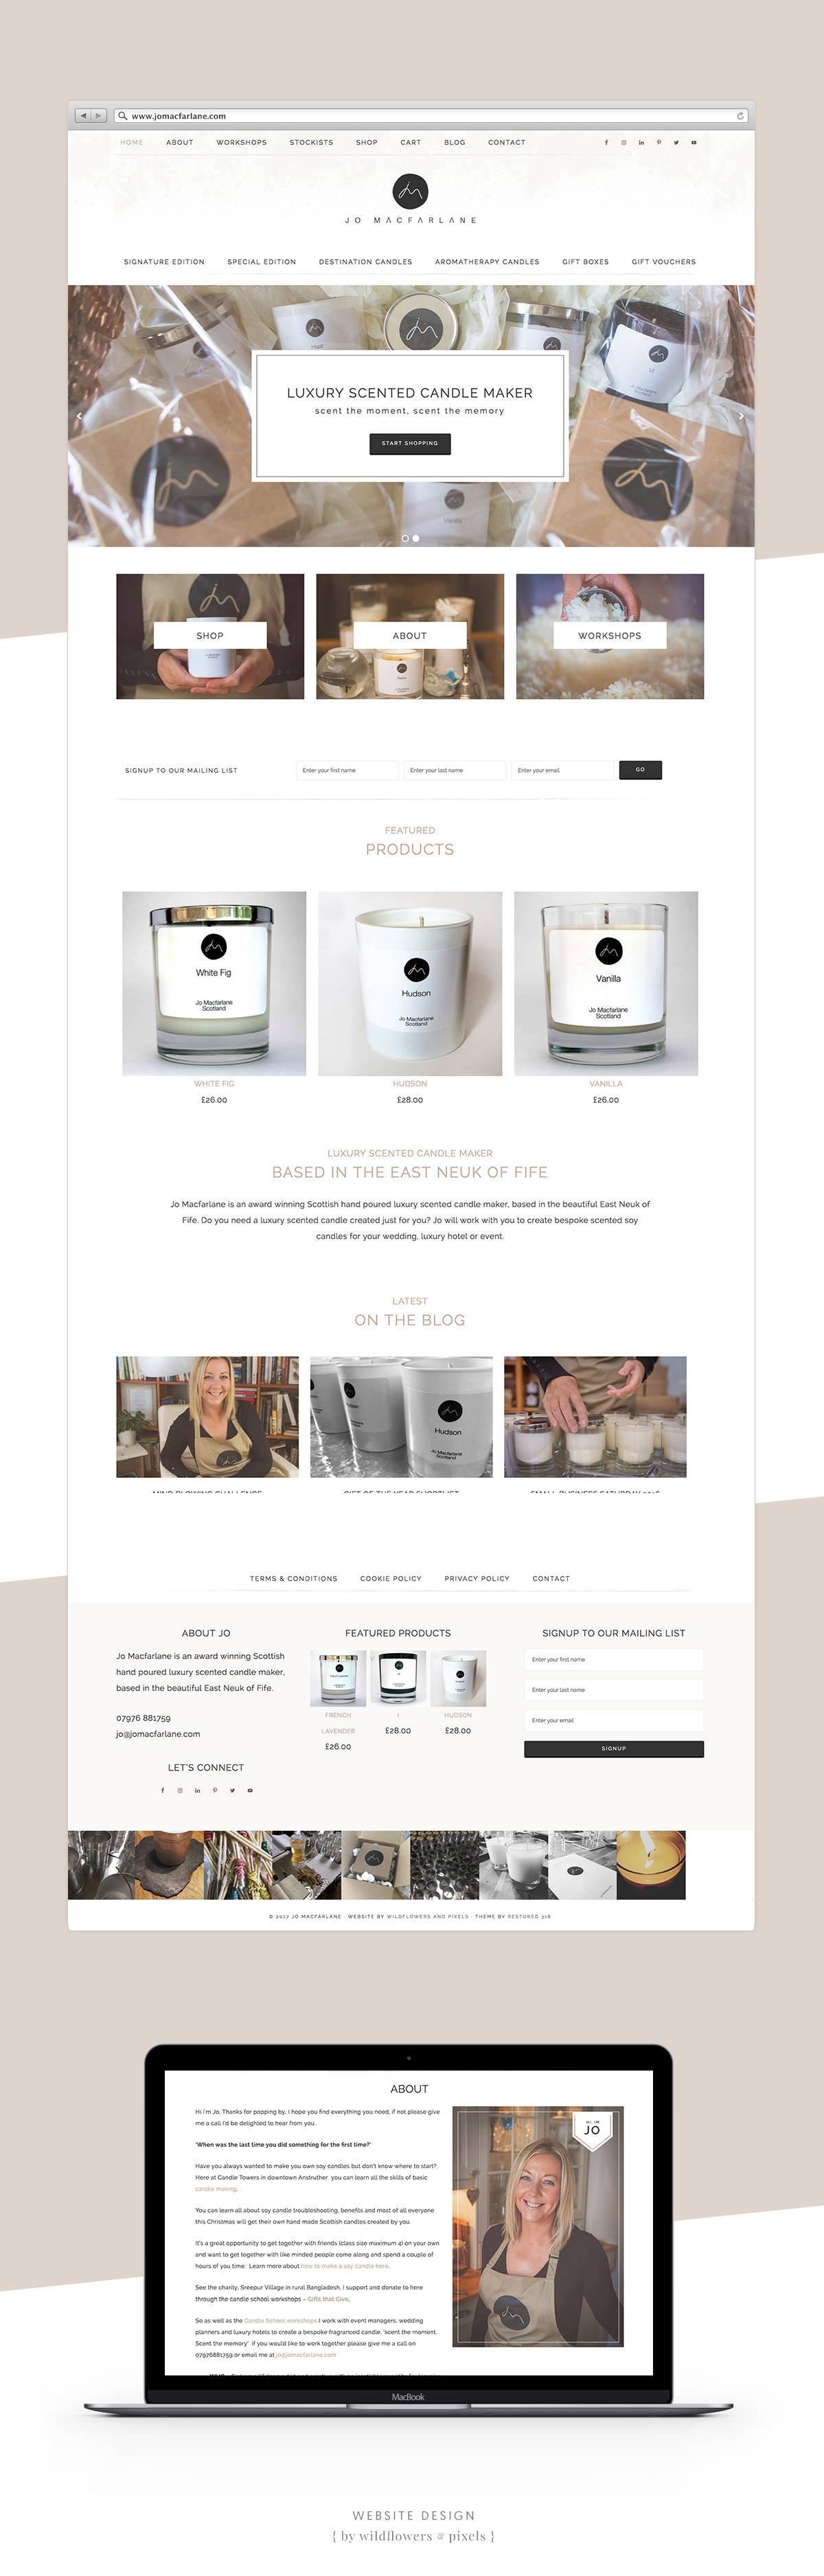 jo-macfarlane-website-design-fife